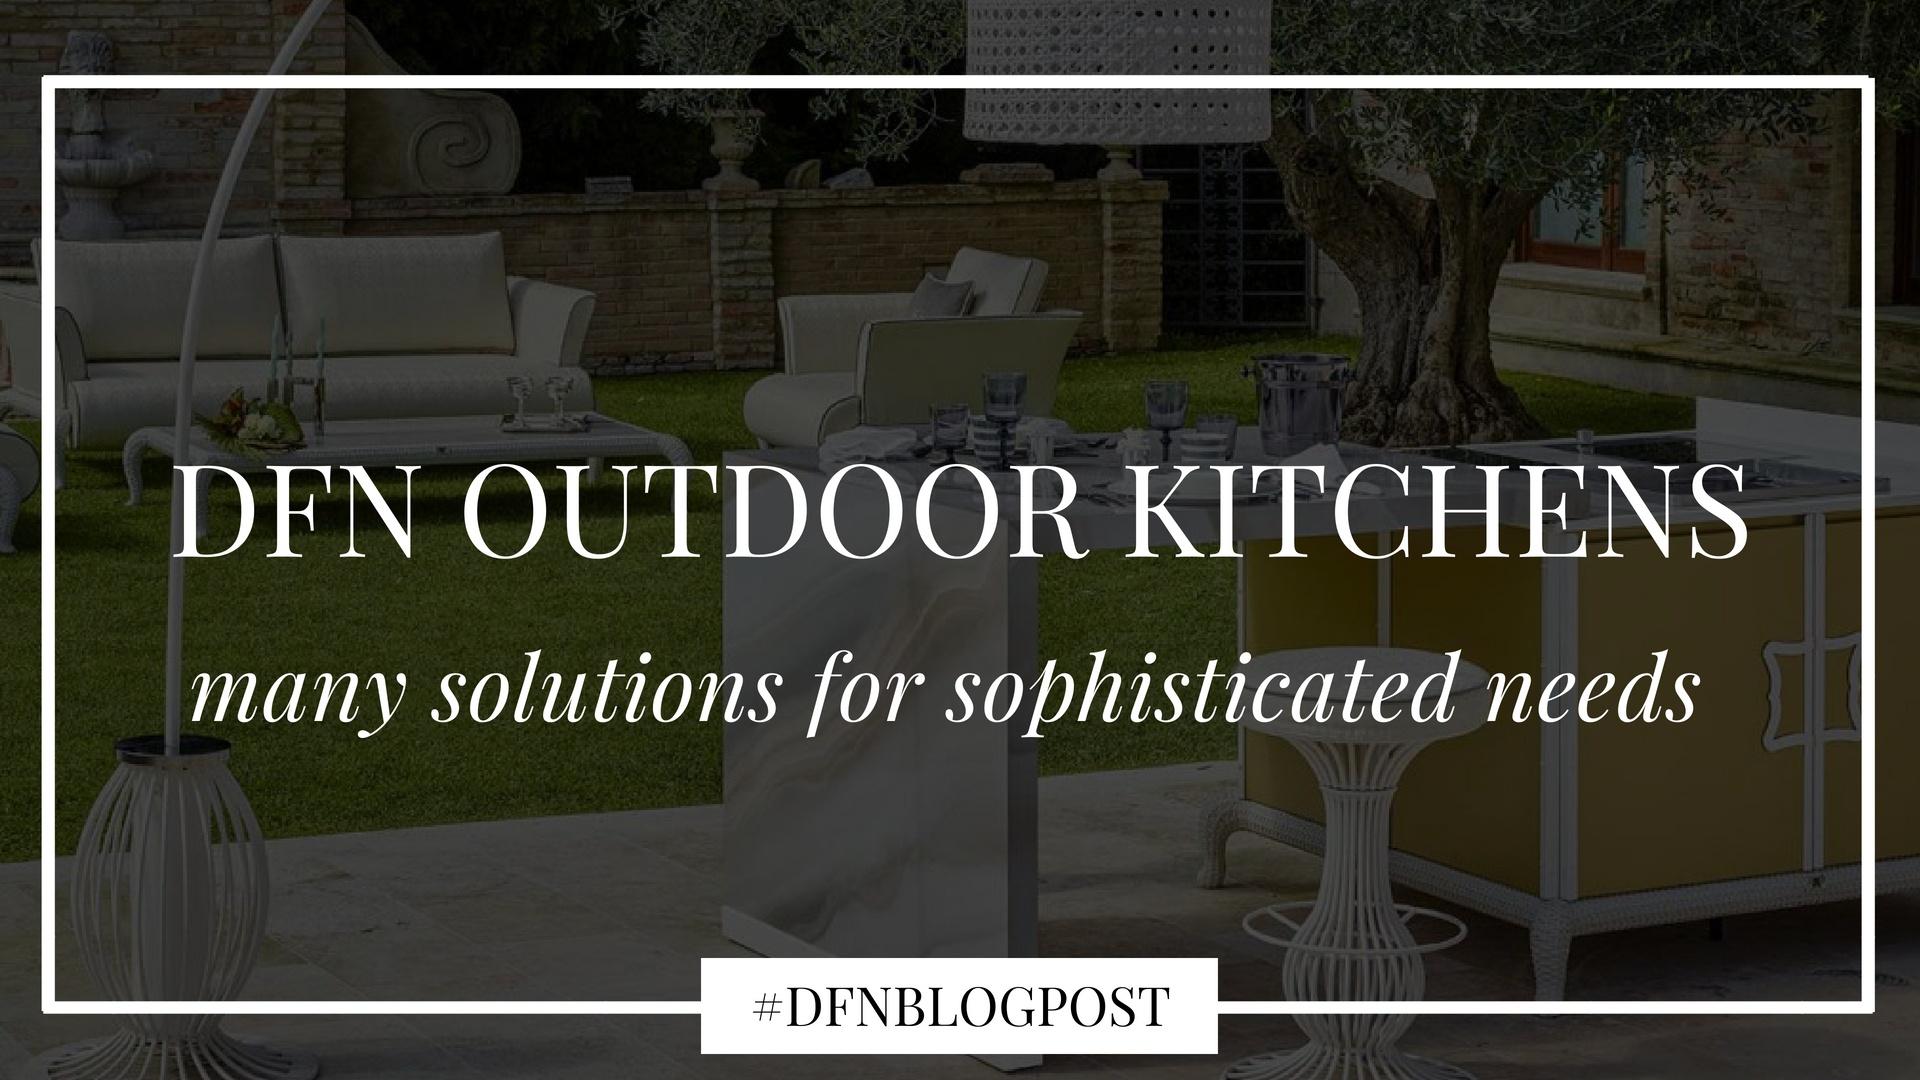 DFN outdoor kitchen